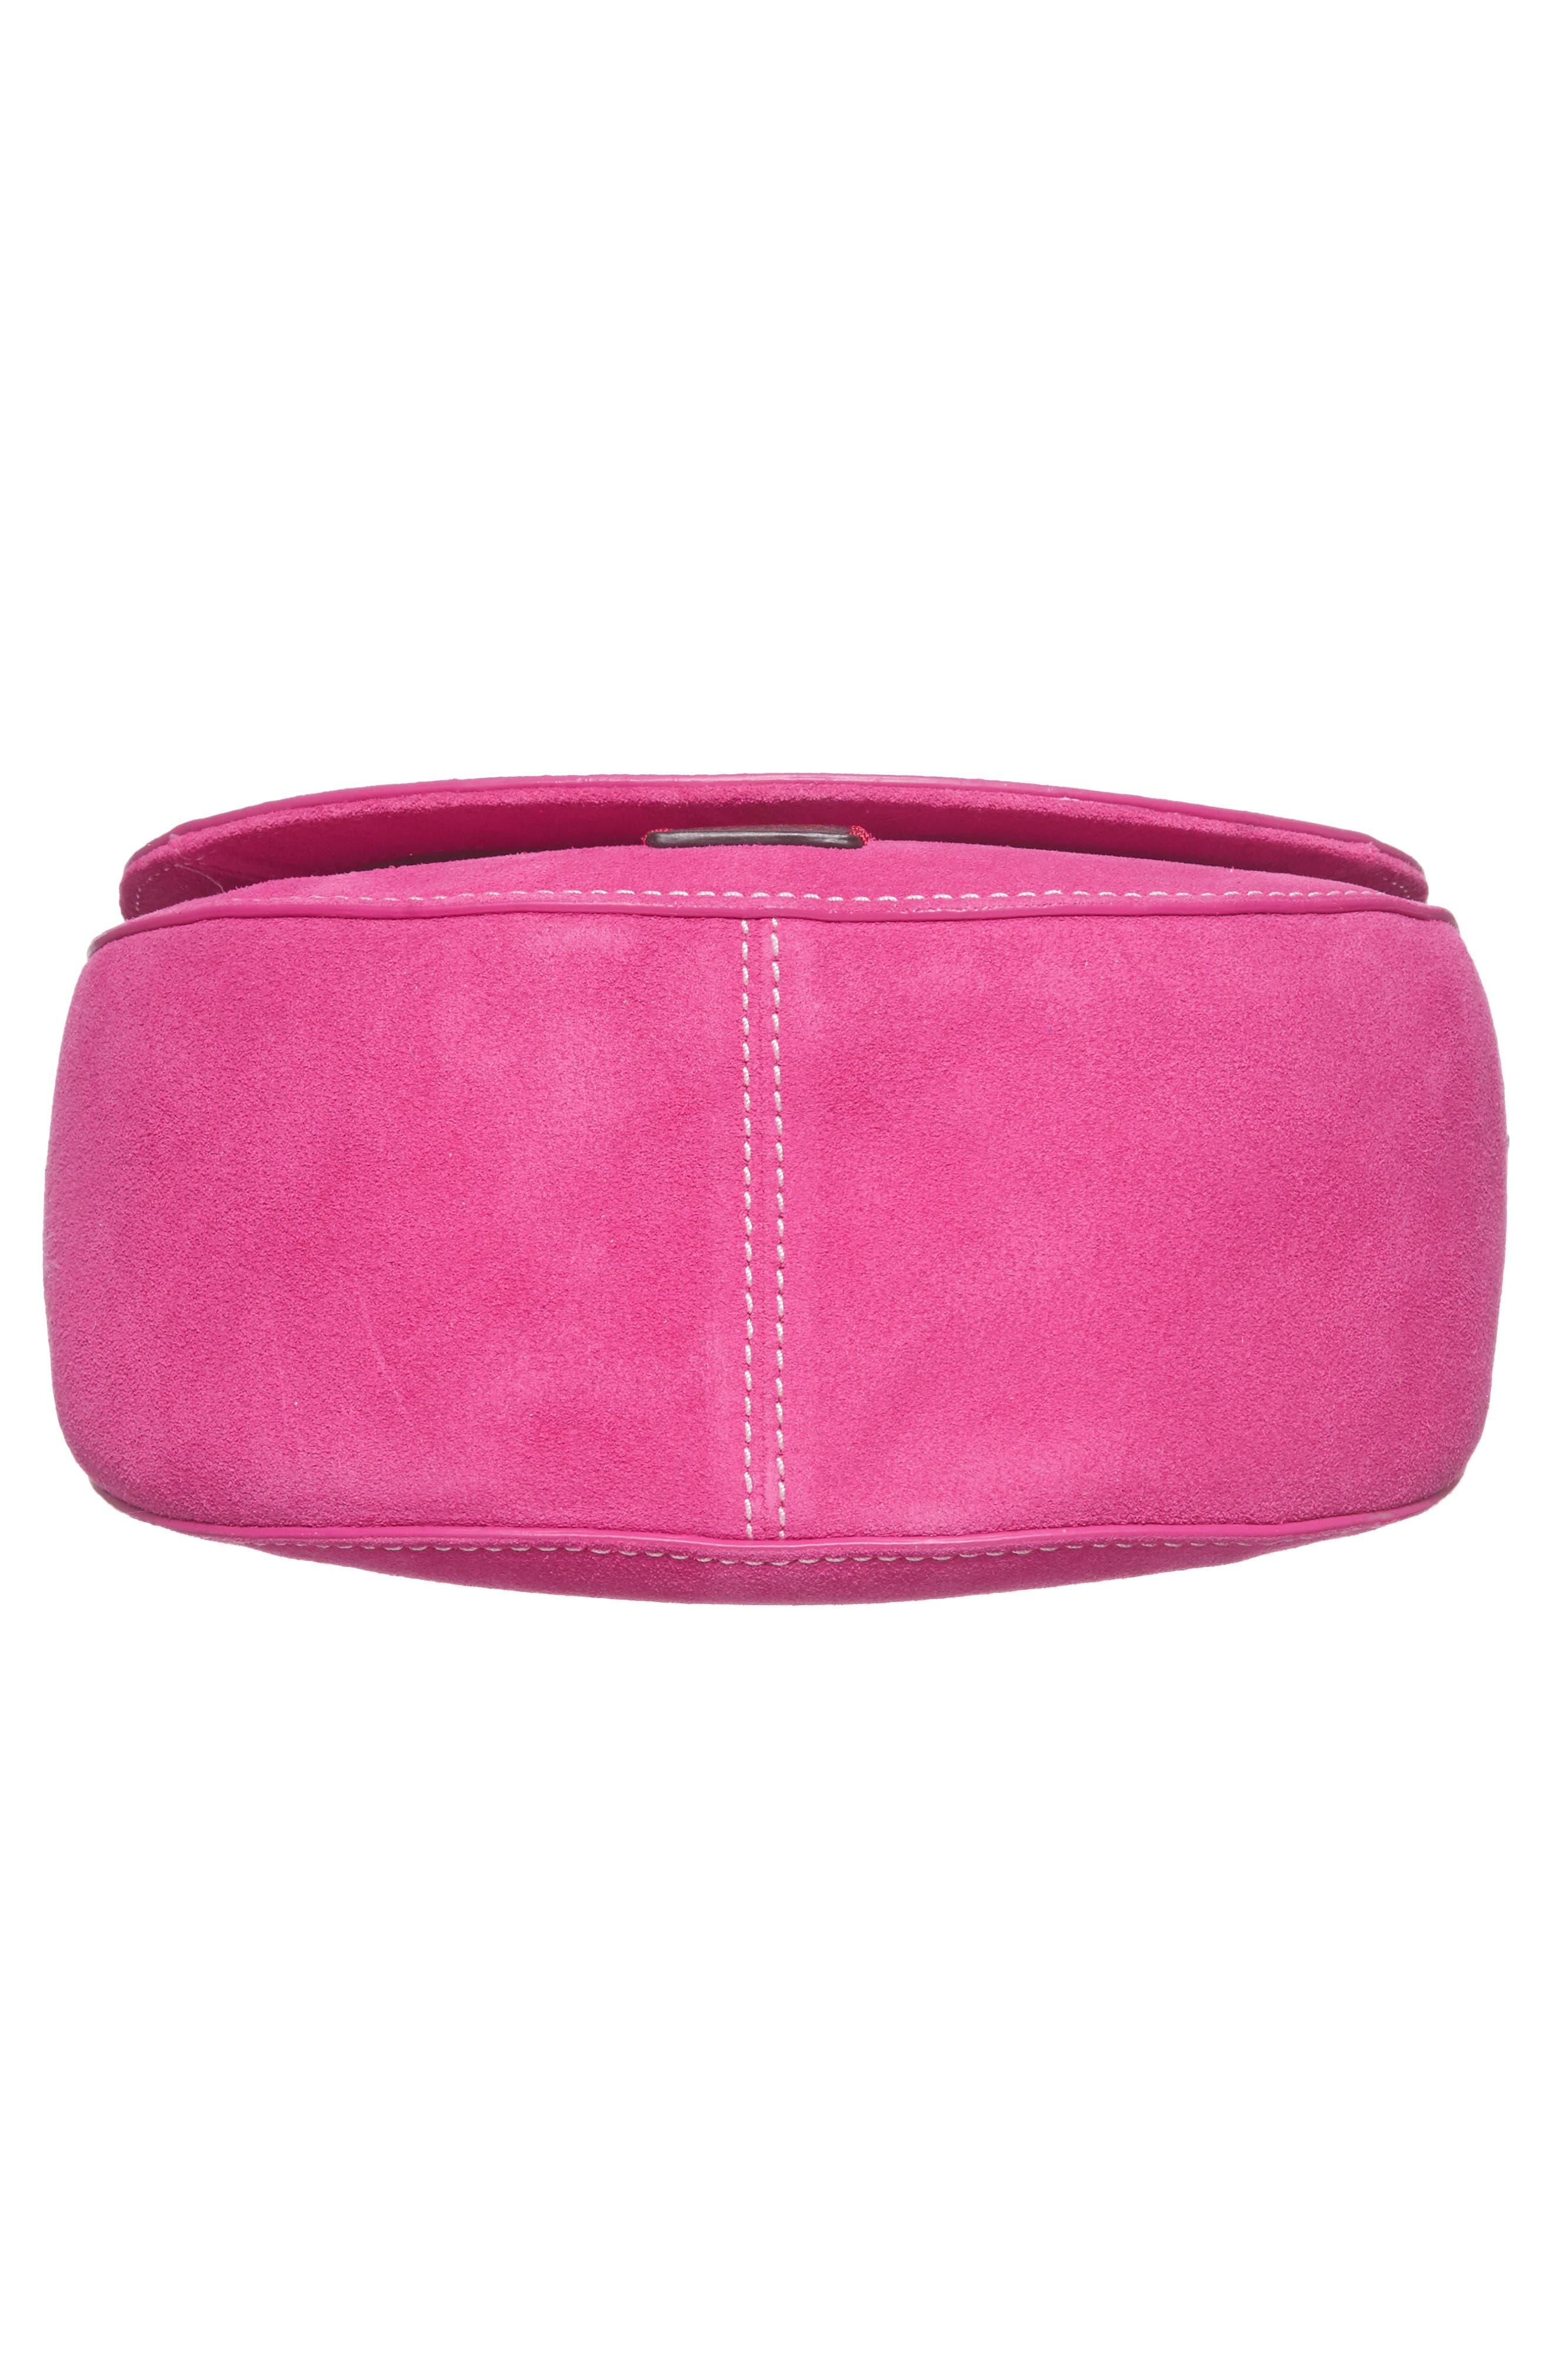 Mini Ellen Suede Crossbody Bag,                             Alternate thumbnail 18, color,